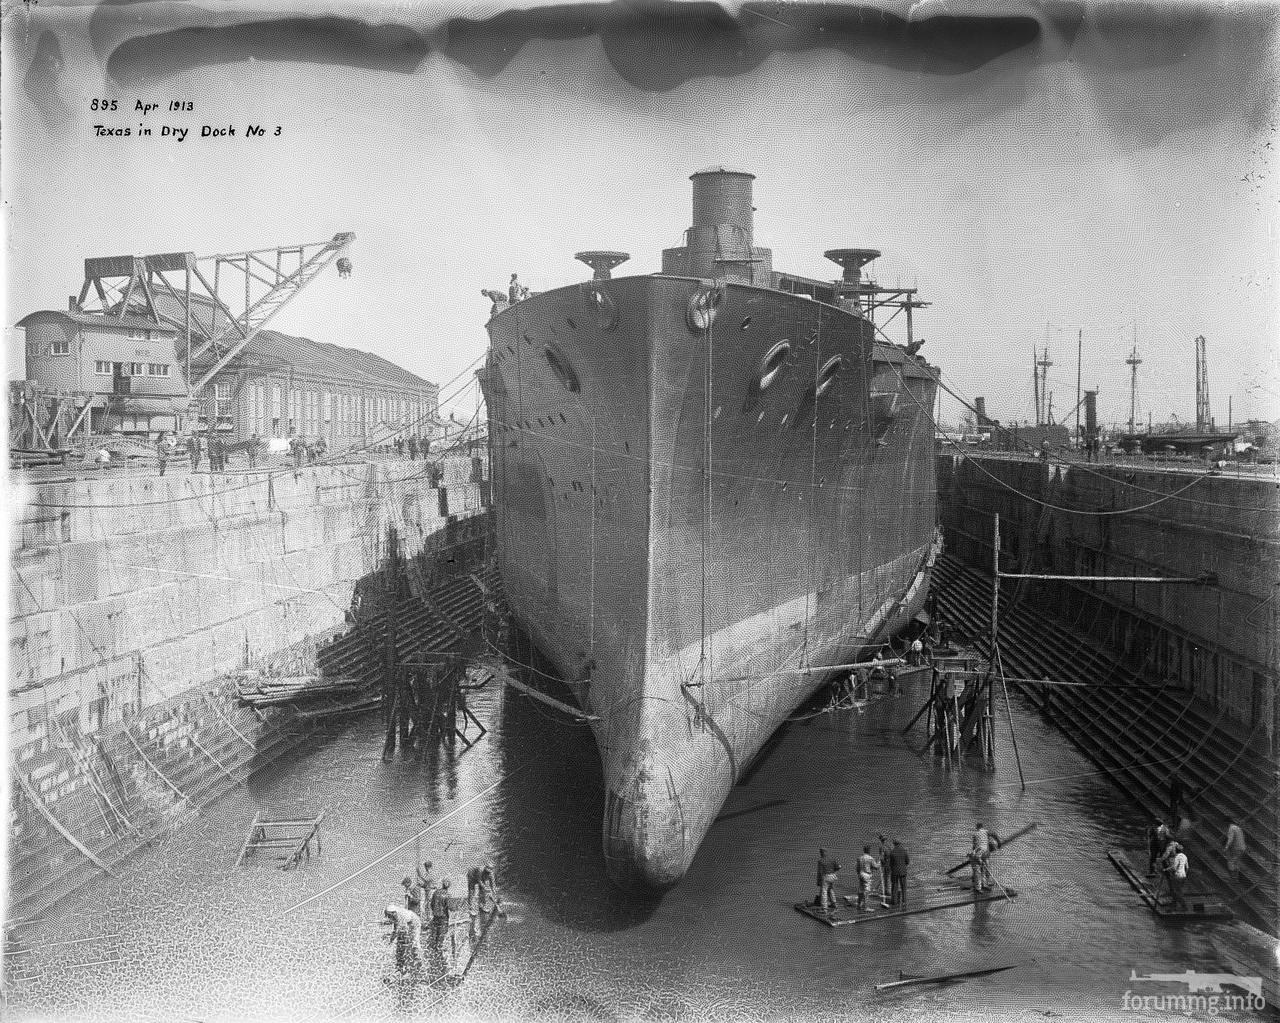 113604 - USS Texas (BB-35) в доке во время постройки, 1913 г.